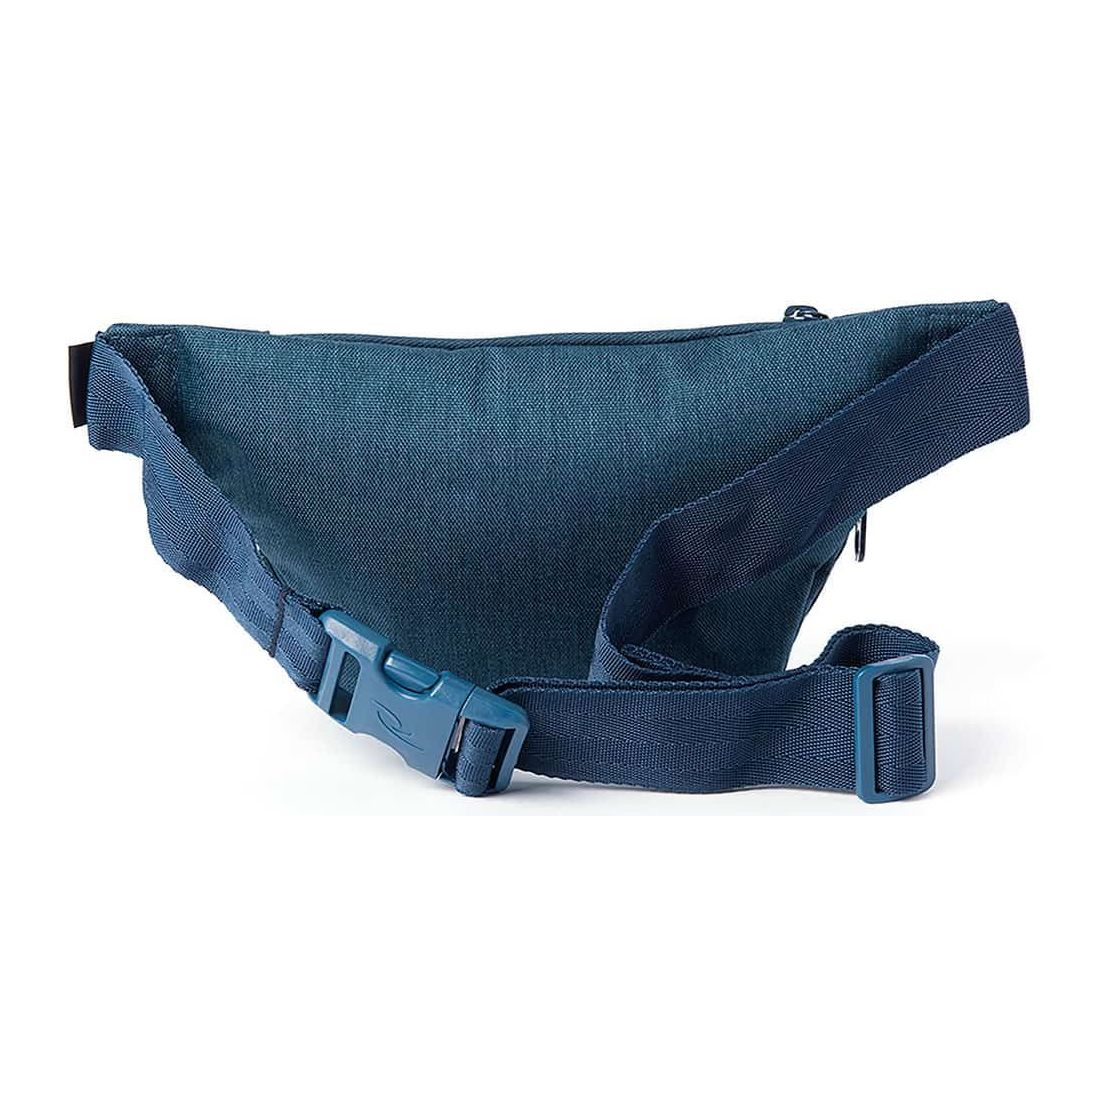 Rip Curl Fanny Pack Cordura Large Blue - Backpacks - Bags